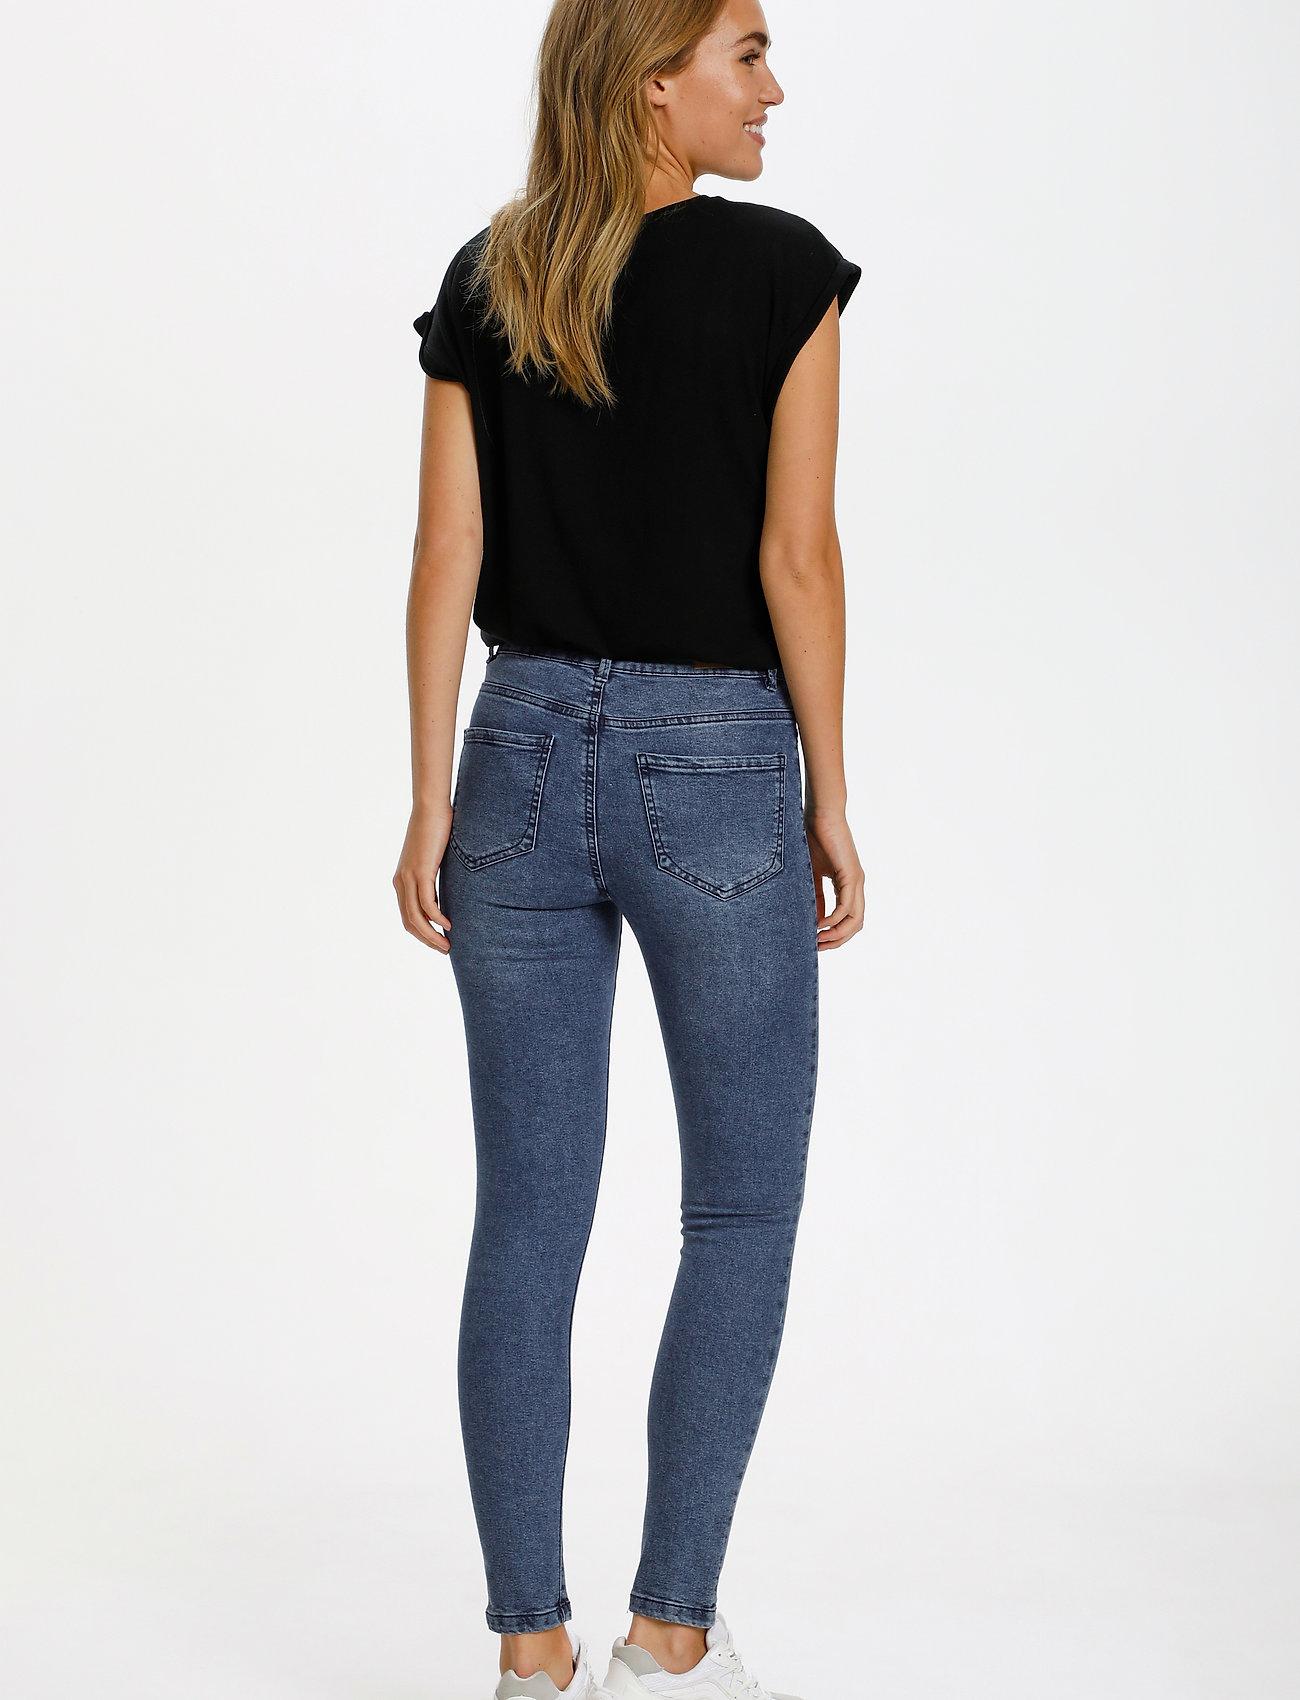 Saint Tropez - T5757, TinnaSZ Jeans - skinny jeans - med.blue - 4